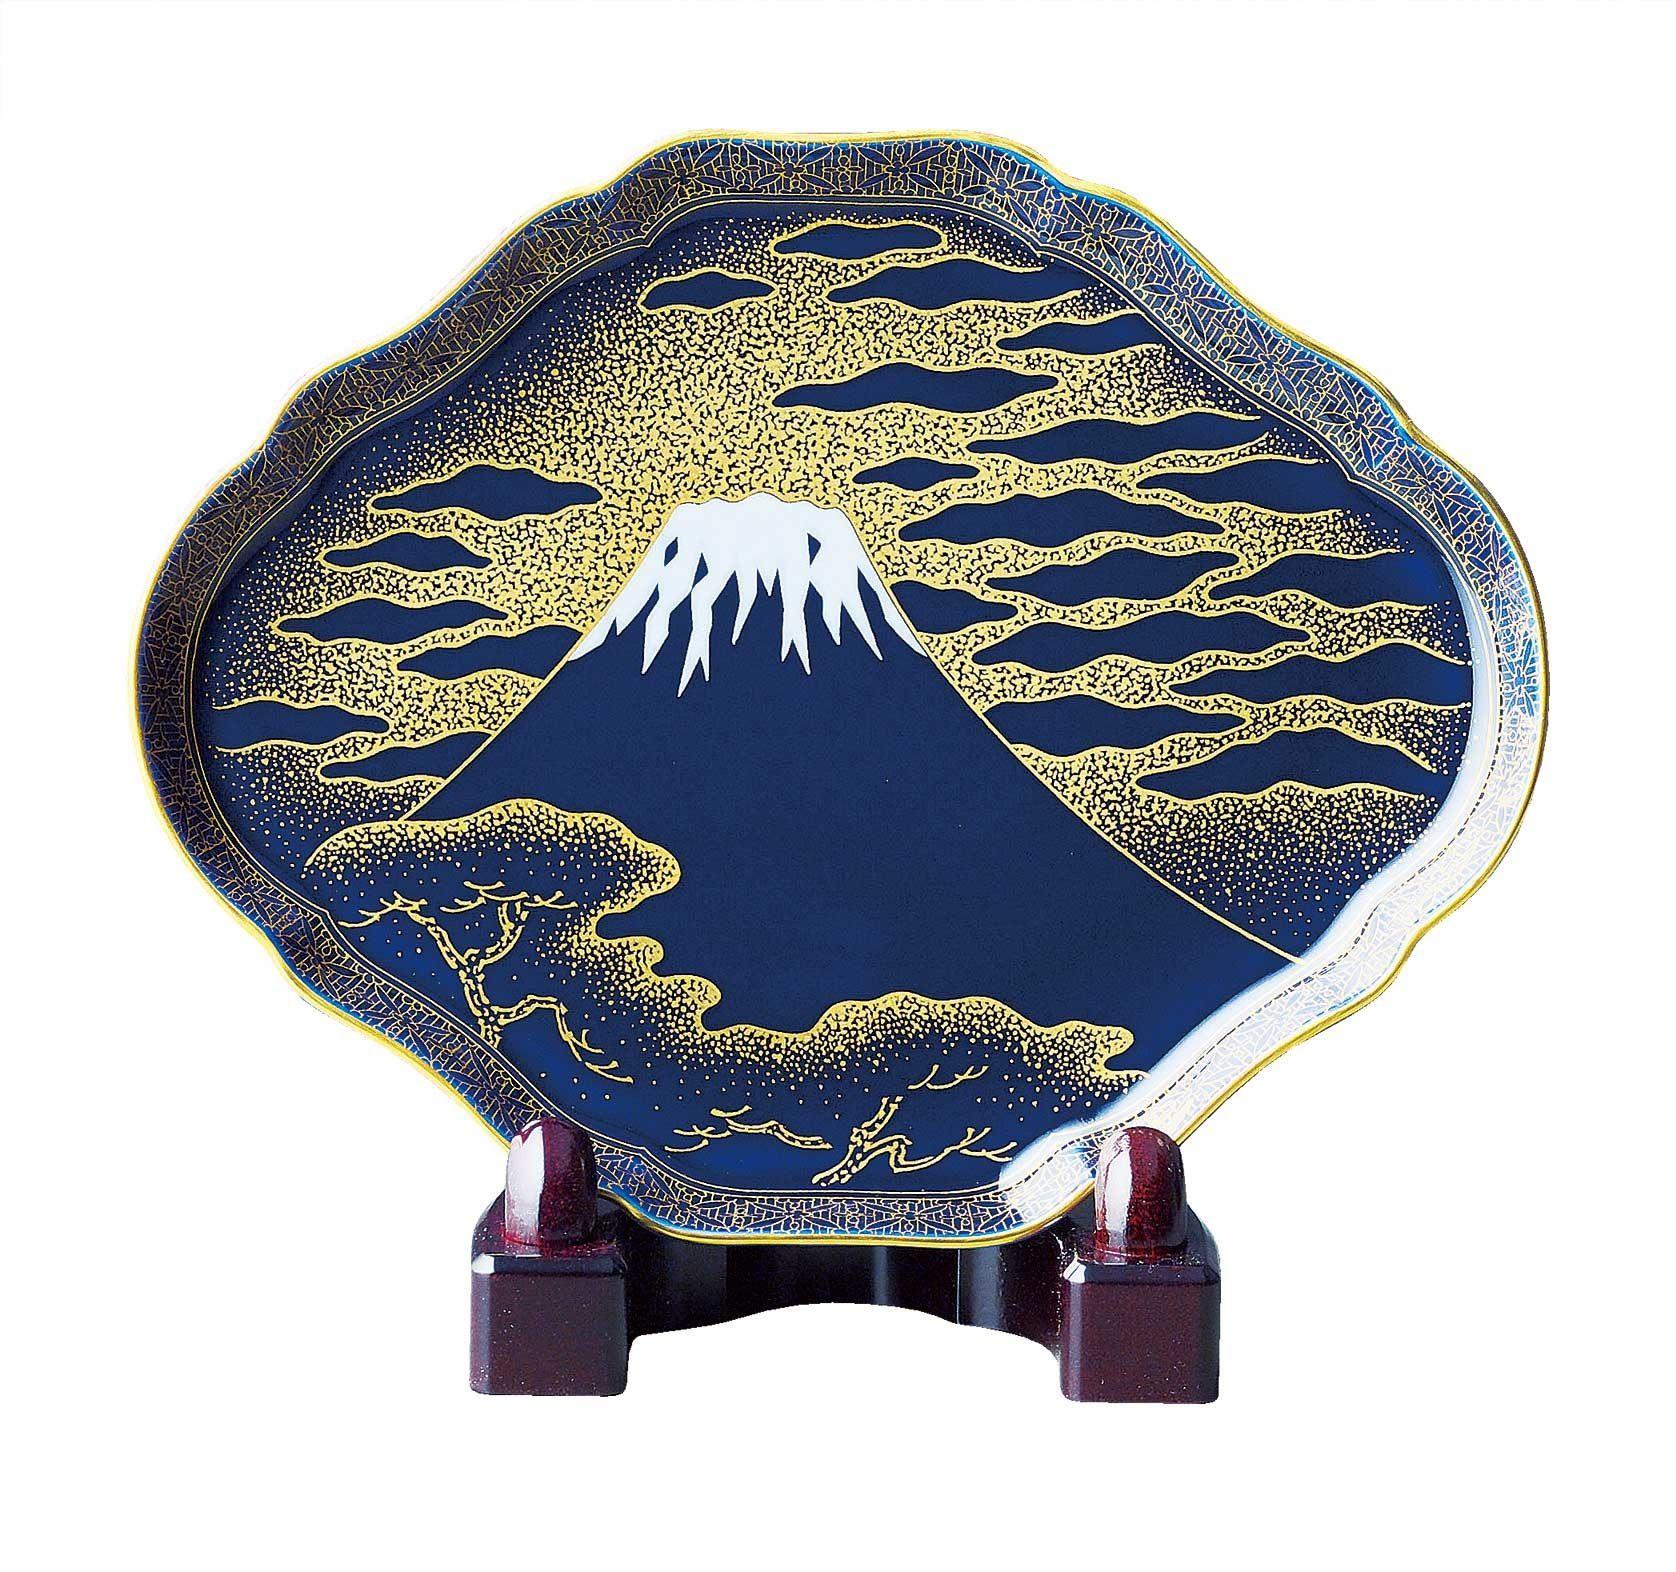 Decorative Arita-Ware with Mt. Fuji (21,600 yen)